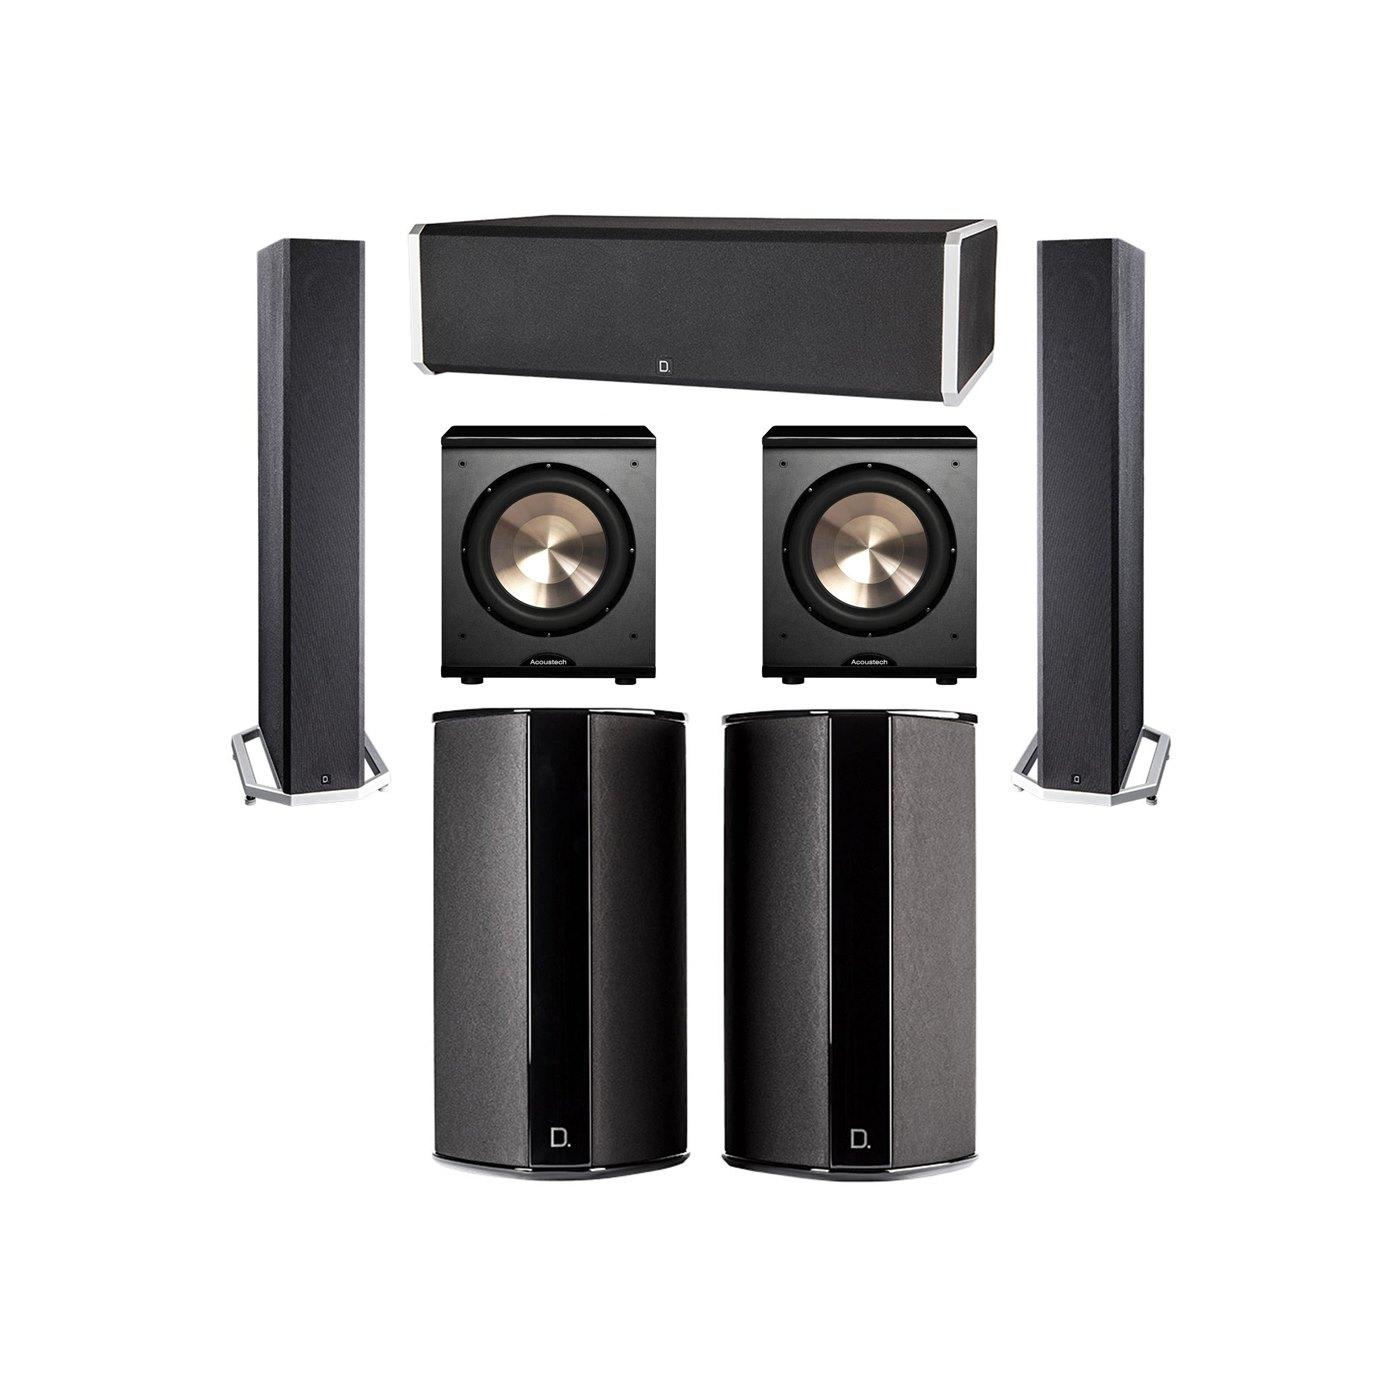 Definitive Technology 5.2 System with 2 BP9040 Tower Speakers, 1 CS9060 Center Channel Speaker, 2 SR9080 Surround Speaker, 2 BIC PL-200 Subwoofer